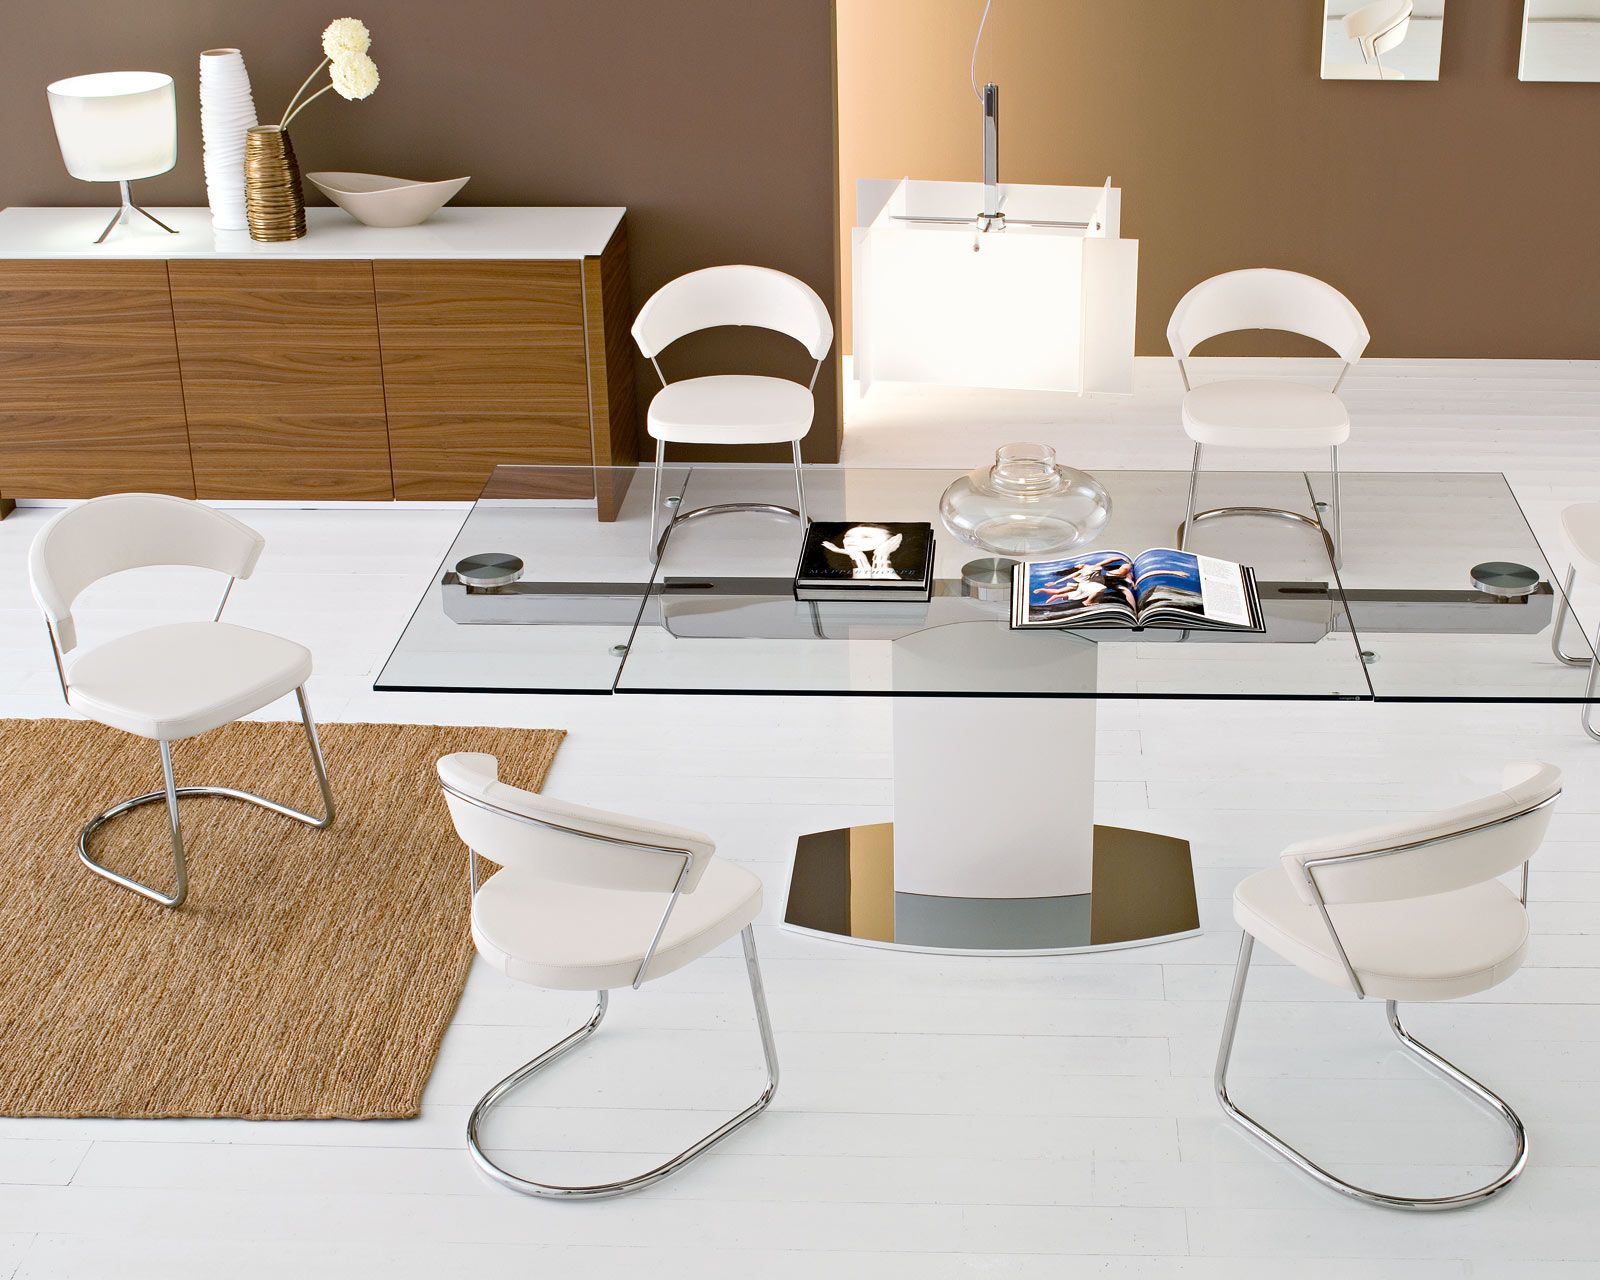 new york chair calligaris - Google Search | Crystal | Pinterest